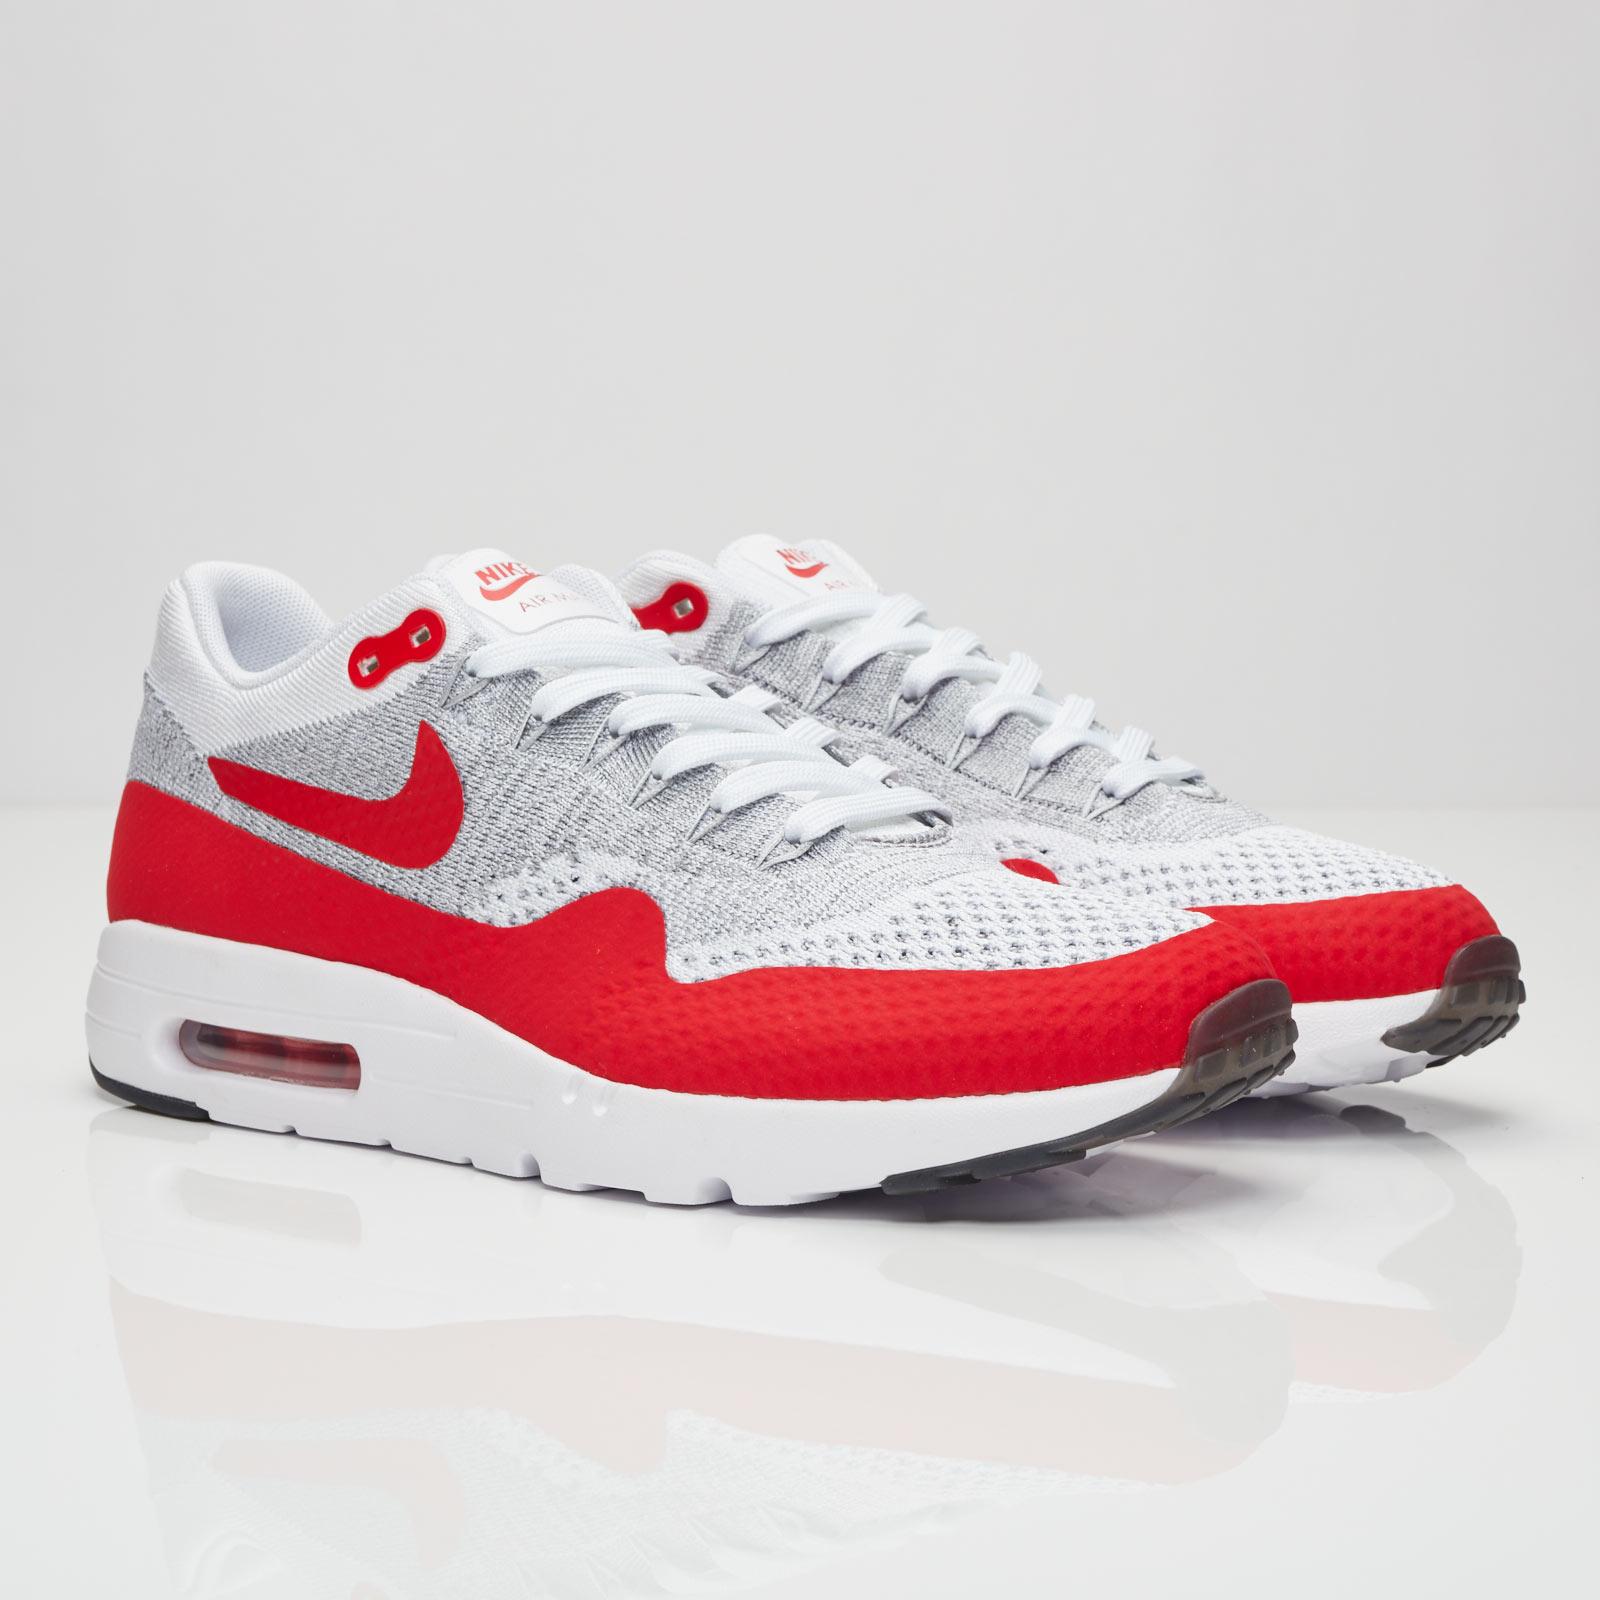 Nike Air Max 1 Ultra Flyknit - 843384-101 - Sneakersnstuff ... 2829773212